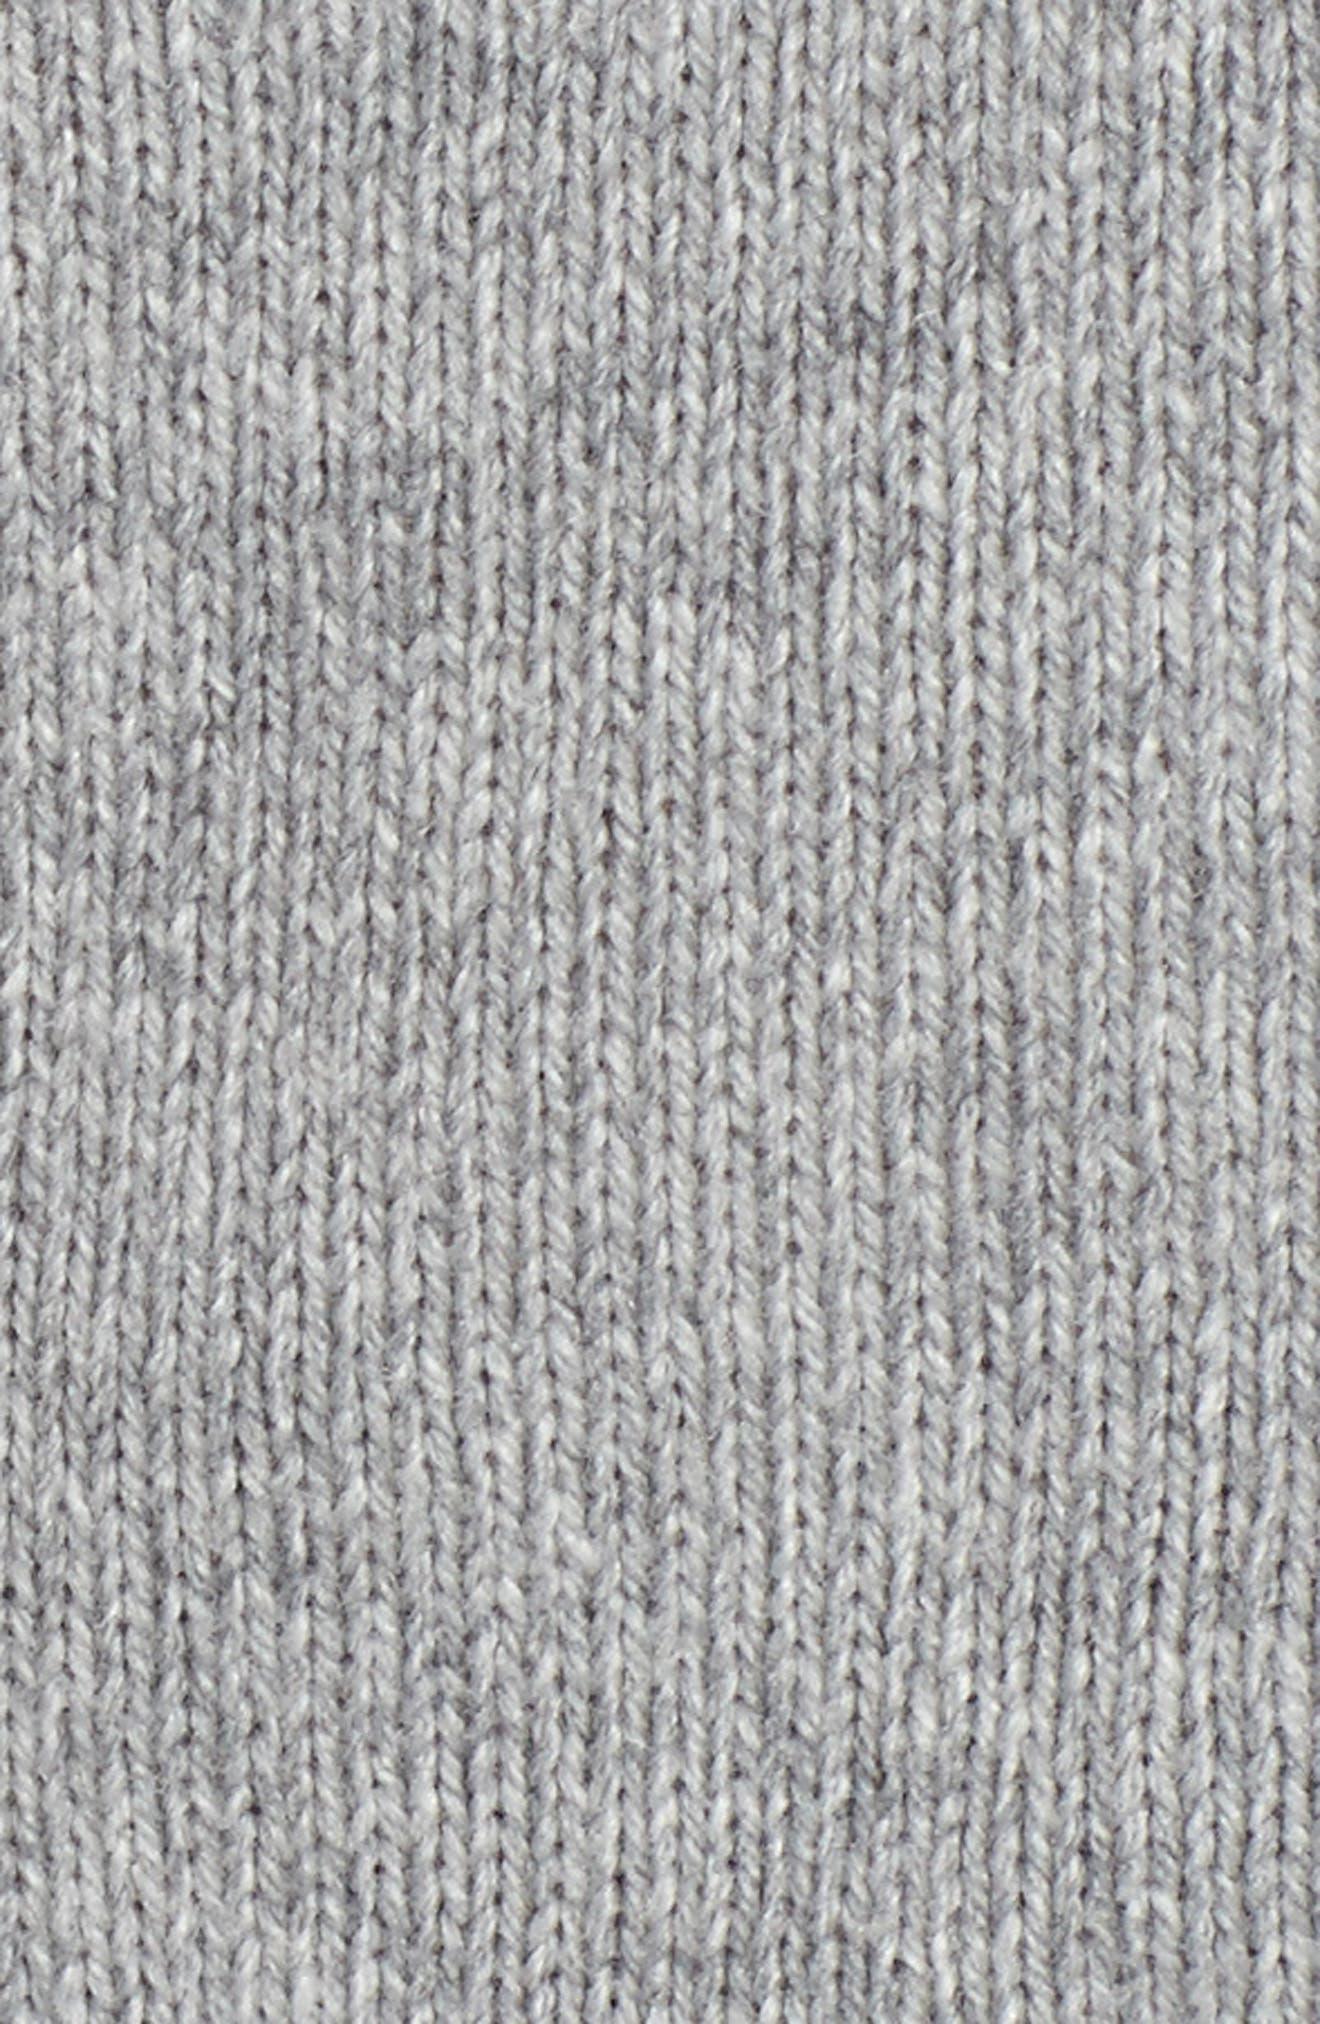 Shoulder Tie Sweater,                             Alternate thumbnail 5, color,                             030